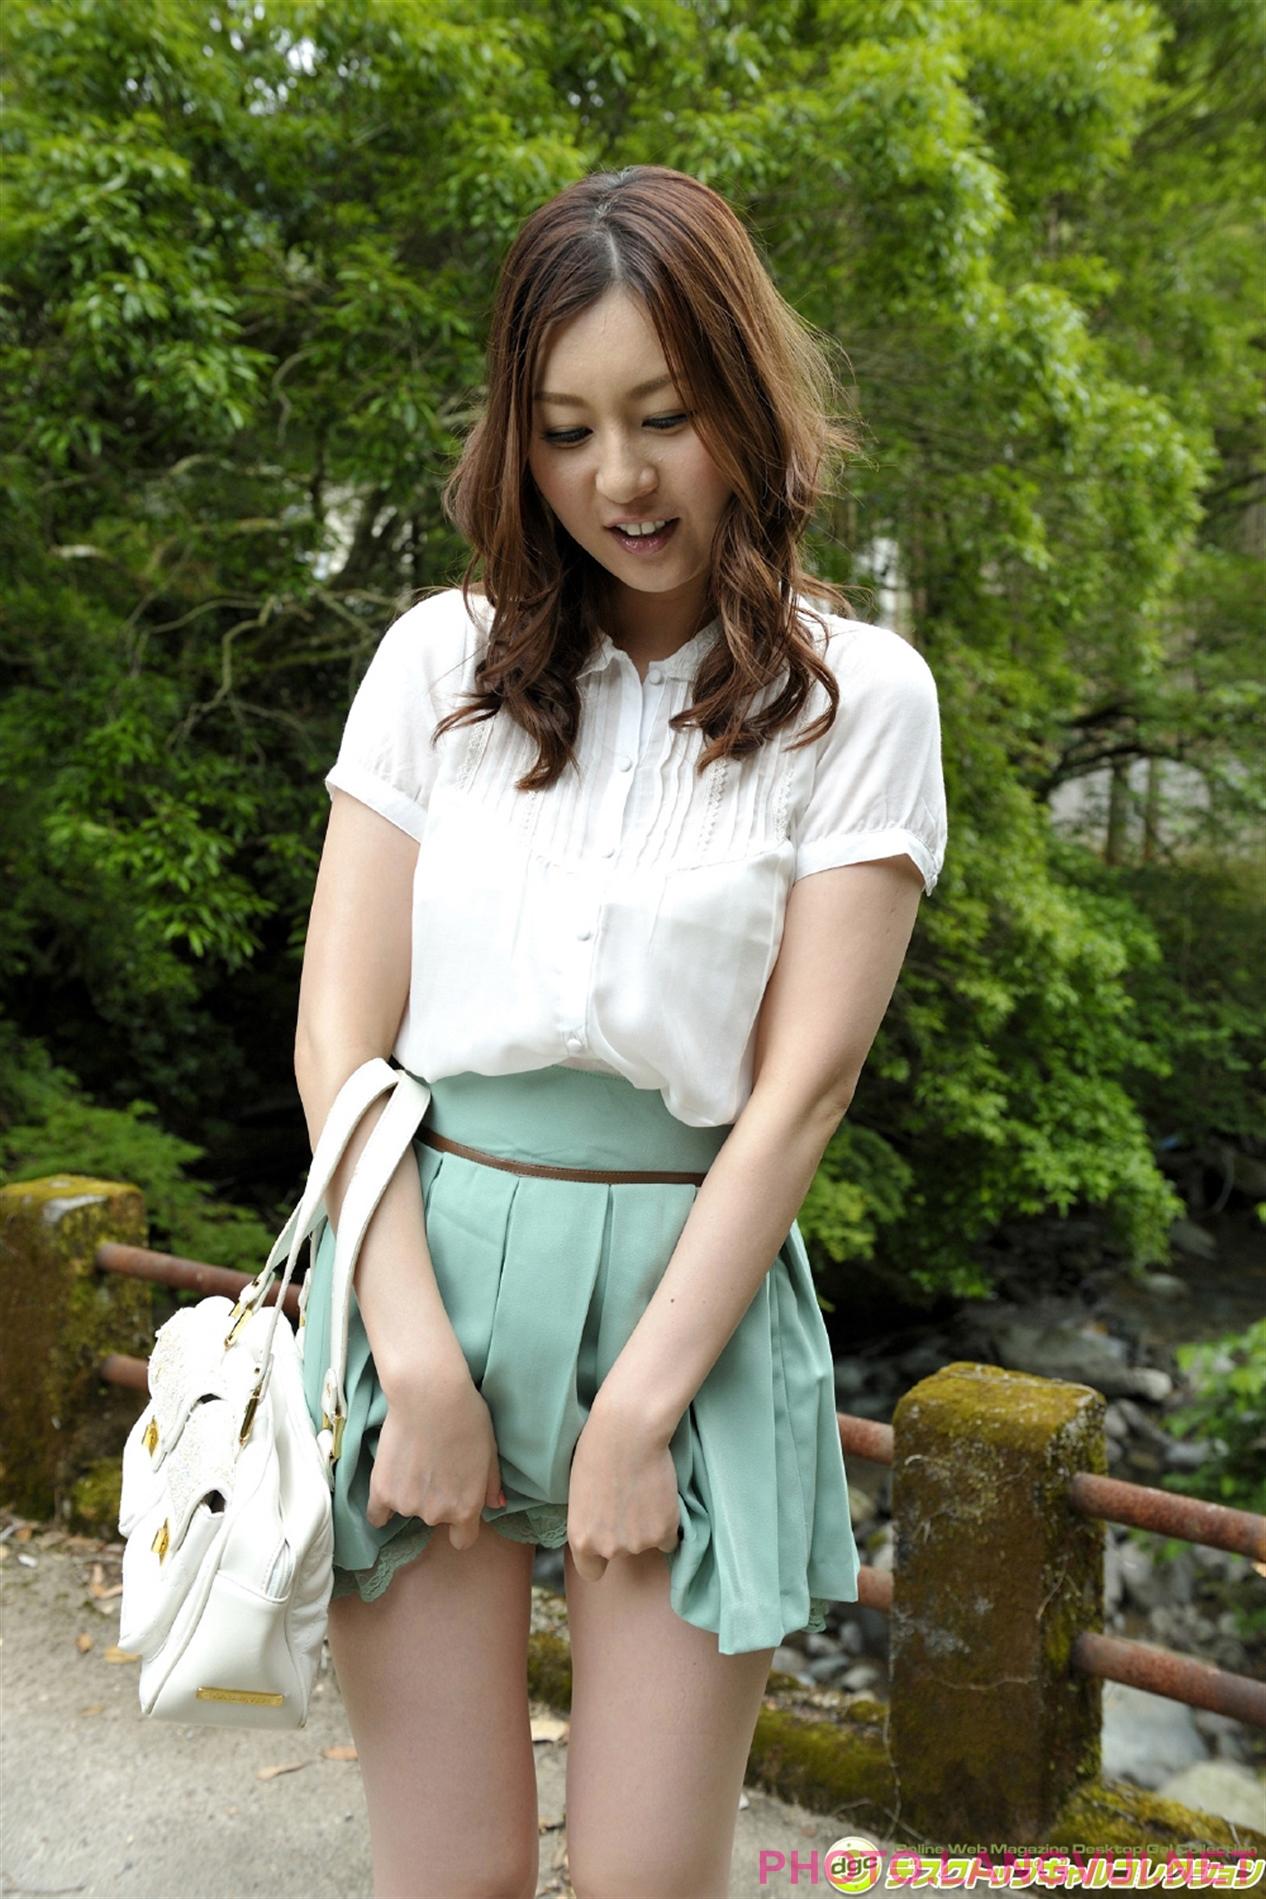 DGC No 1213 Yui Tatsumi - Page 8 of 11 - Ảnh Girl Xinh